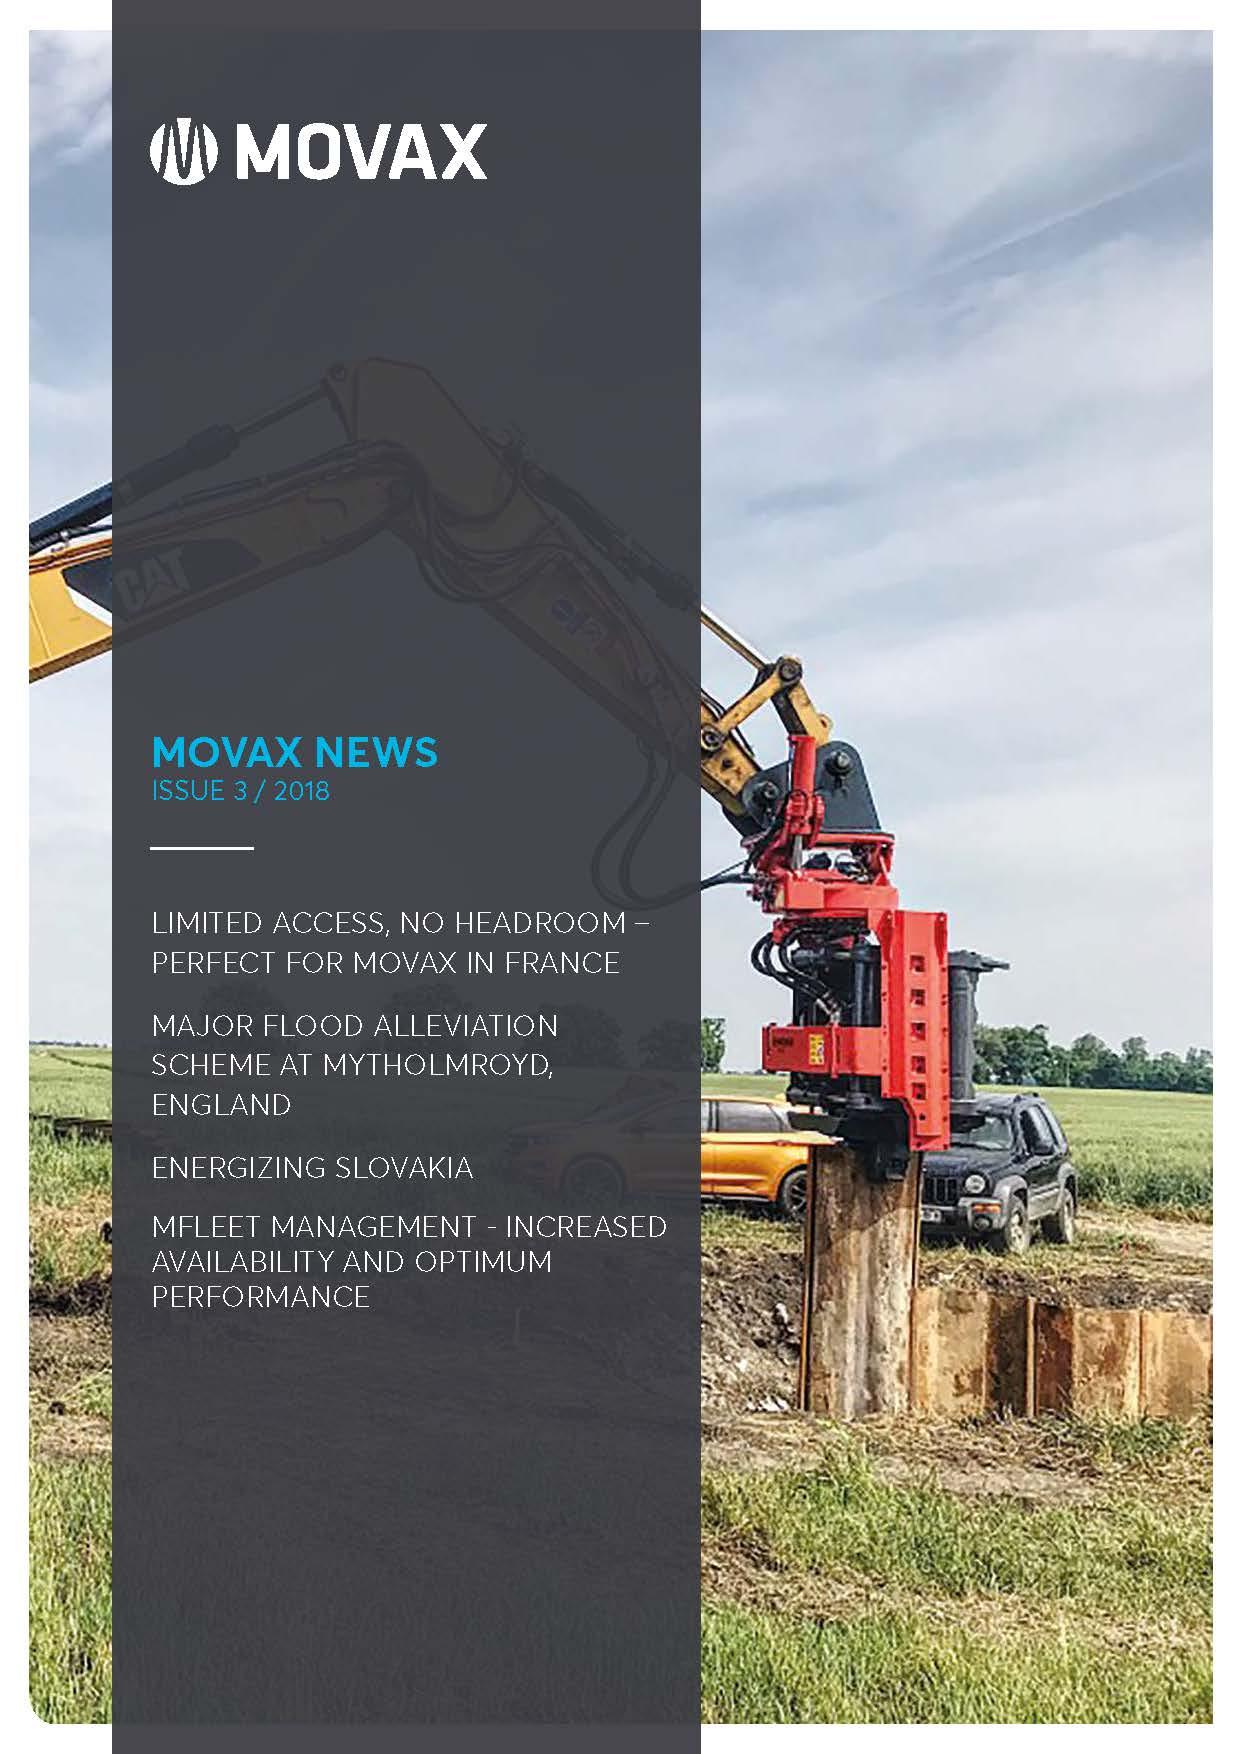 Movax News 03/2018